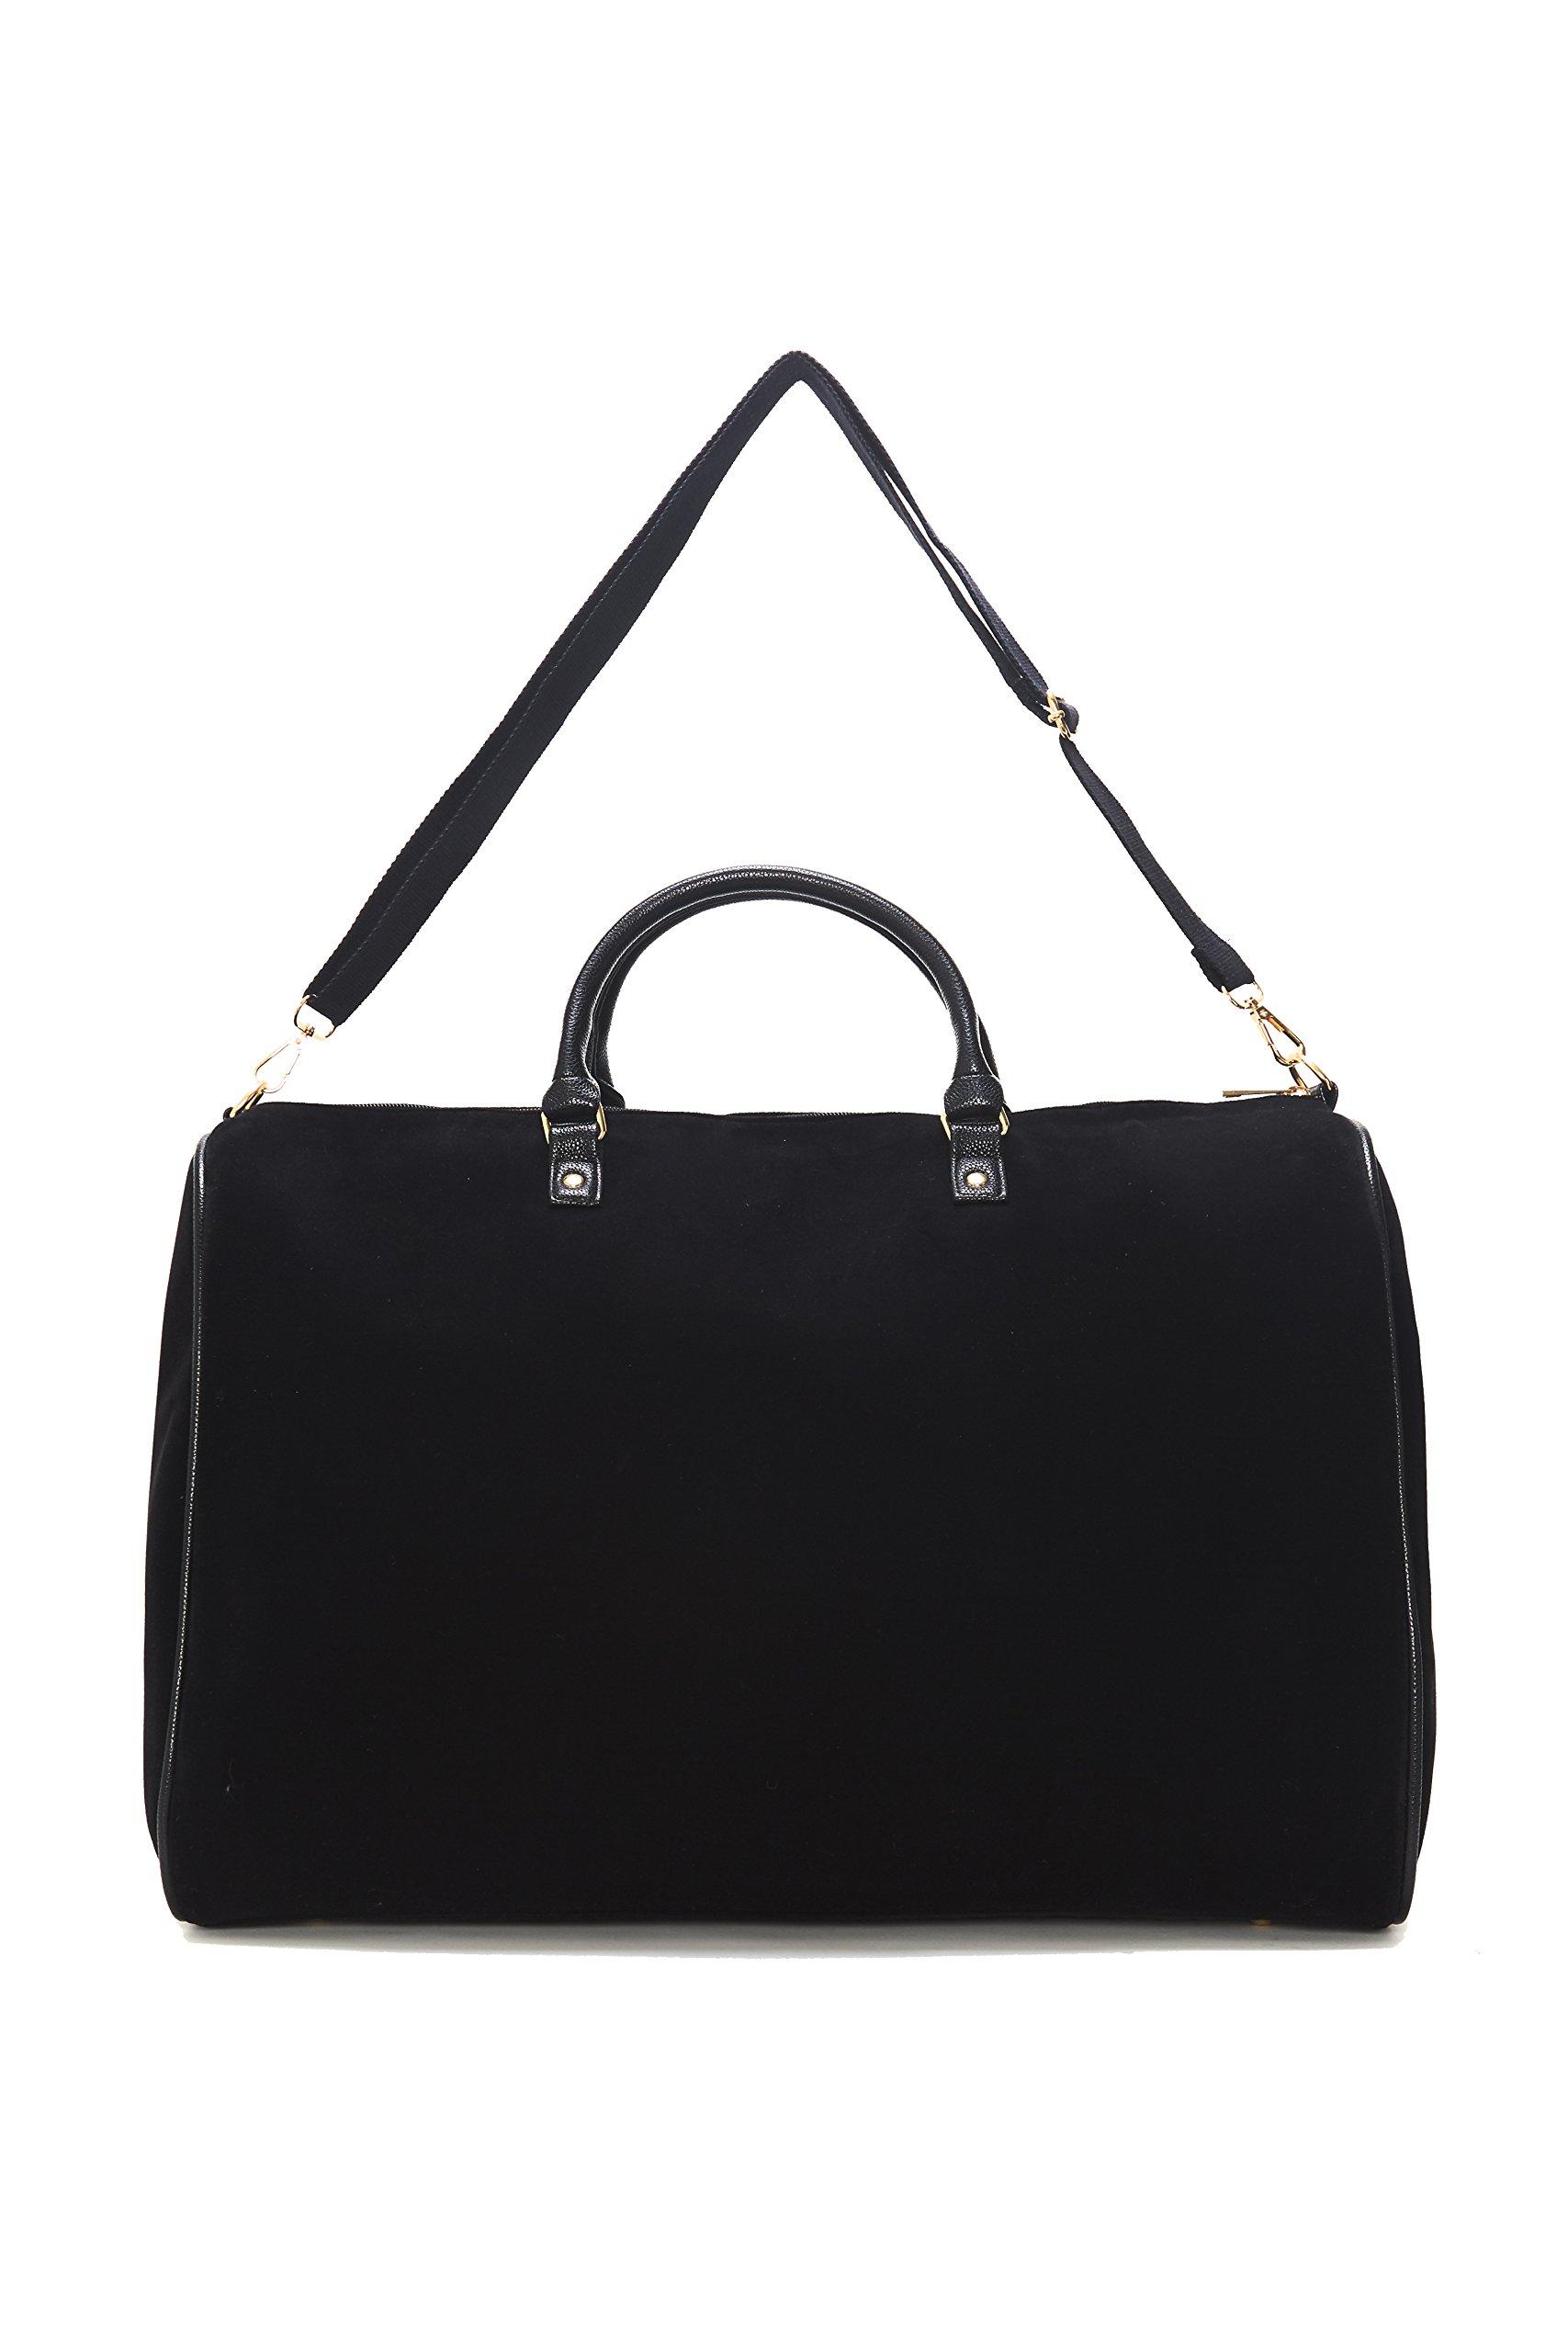 Limited Time Sale - Womens Black Velvet Weekender Bag, Duffle Bag, Overnight Bag, Travel Bag, Luggage, Large Tote Bag, Fashion Bag, Durable Bag, Best Handbag for women (Classic Black) - MSRP $99 by Lulu Dharma (Image #3)